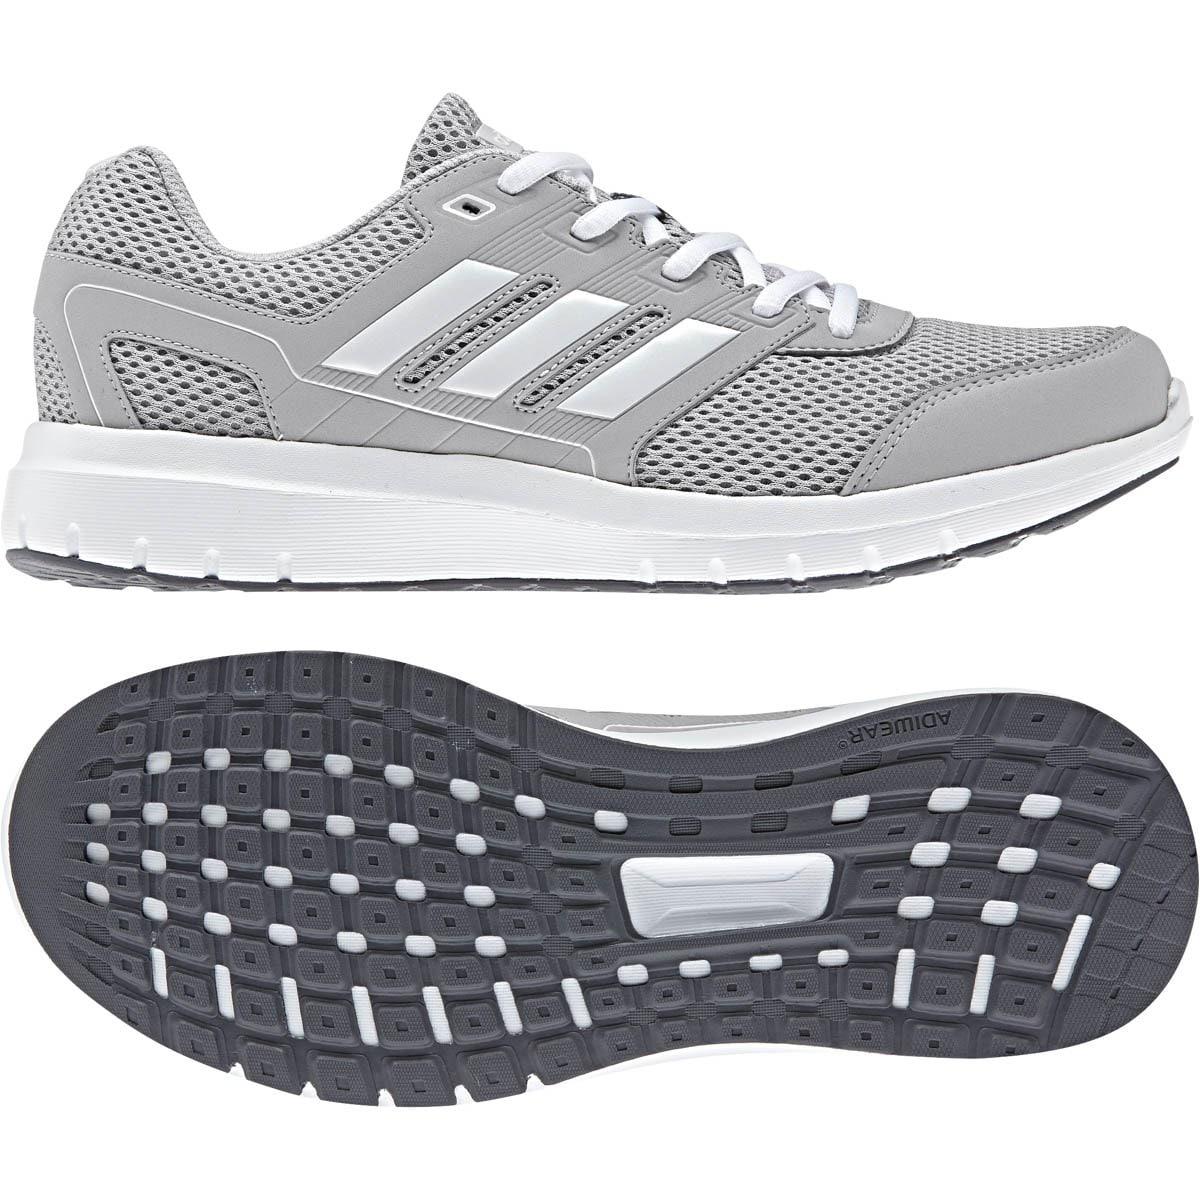 Tenis Running Duramo Lite 2.0 Adidas - Dama